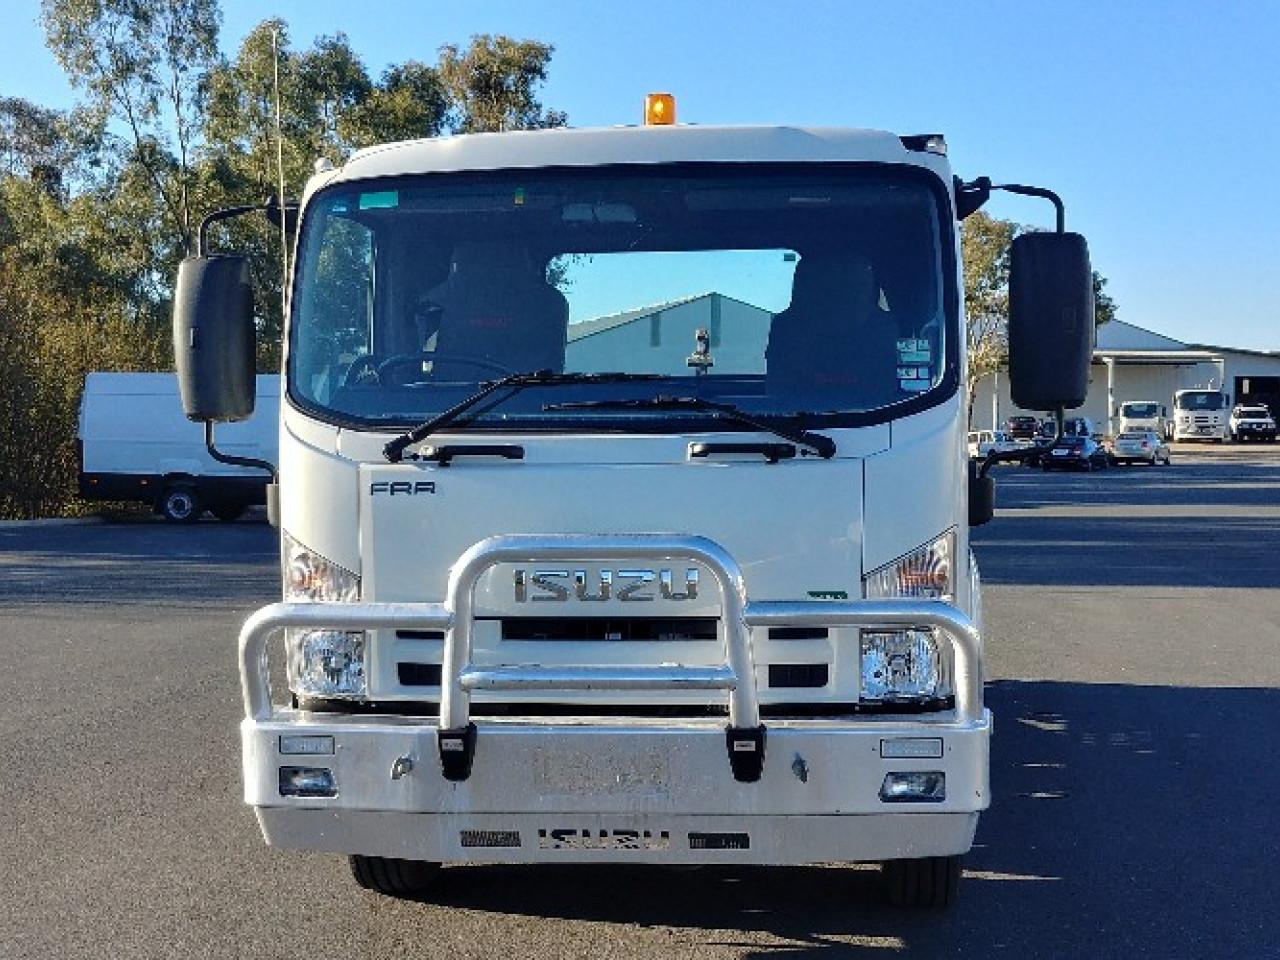 2014 subaru legacy manual transmission